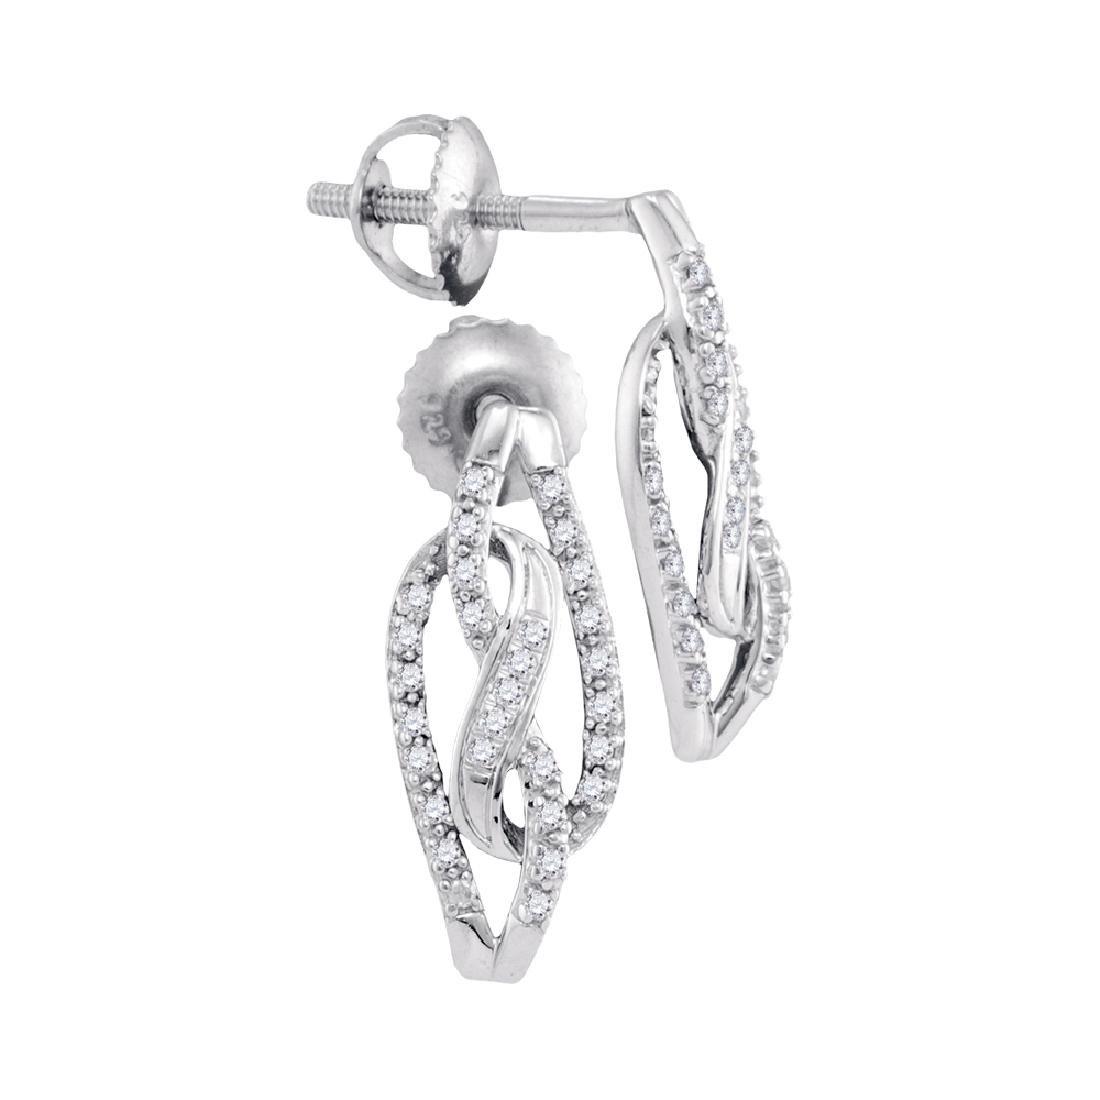 0.15 CTW Diamond Infinity Screwback Stud Earrings 10KT